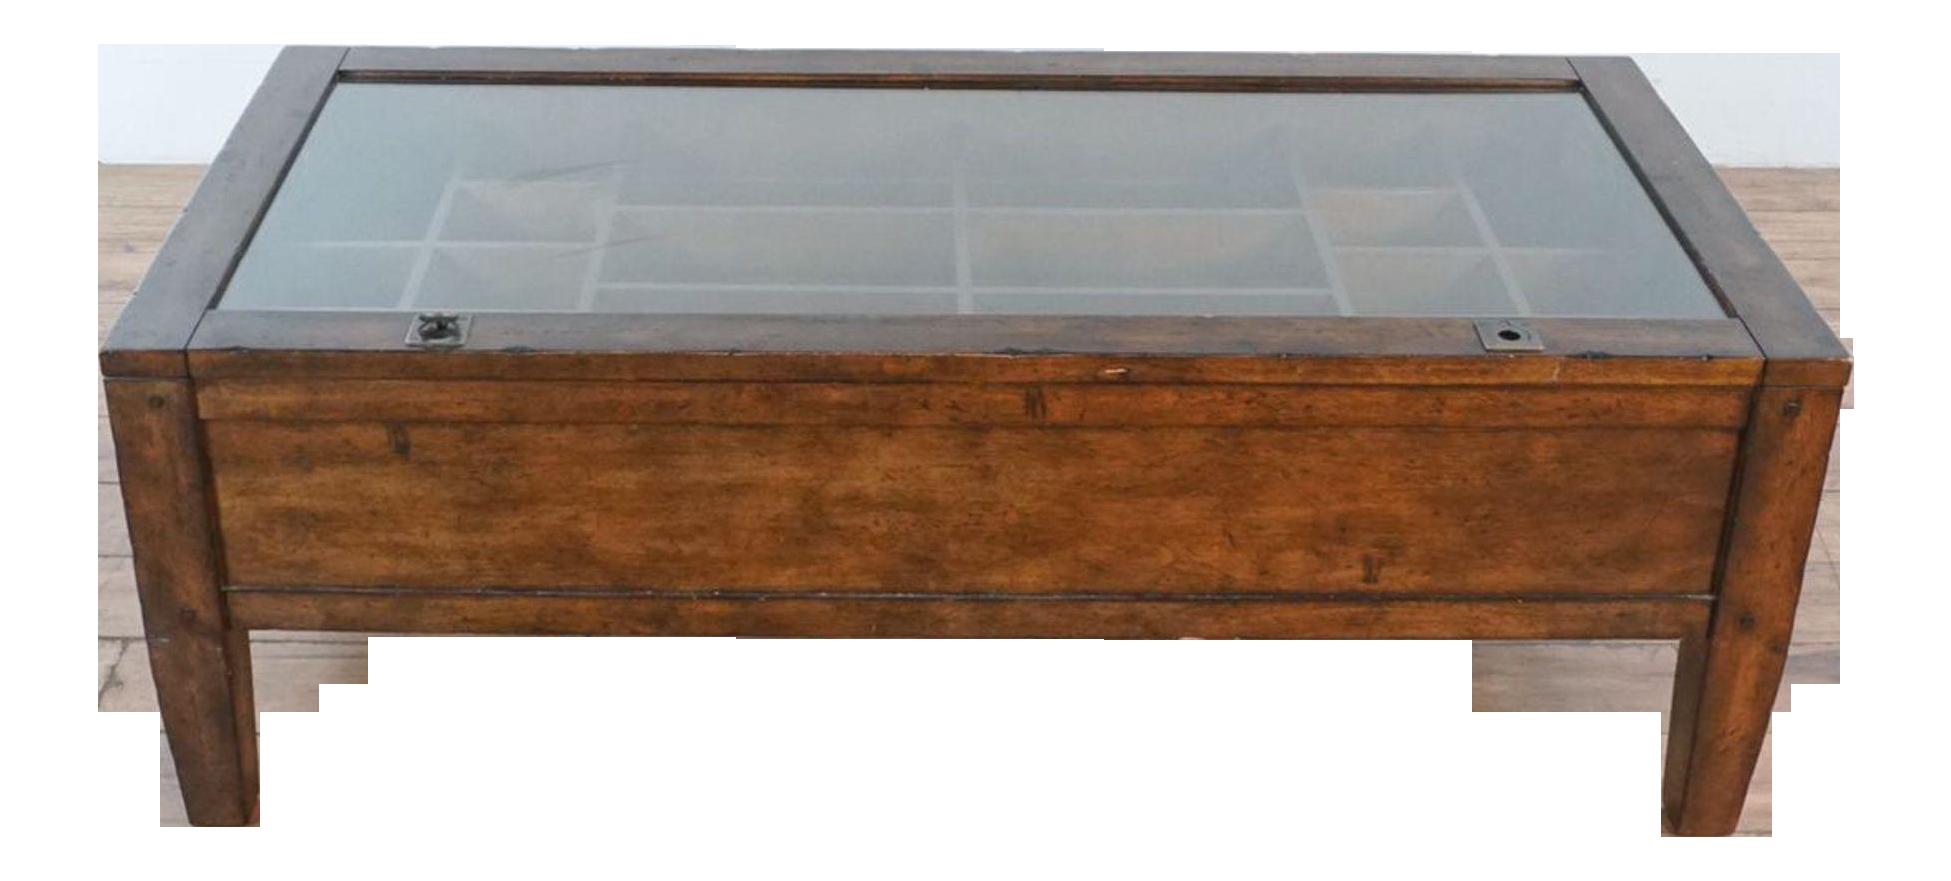 - Pottery Barn Townsend Shadowbox Coffee Table Chairish